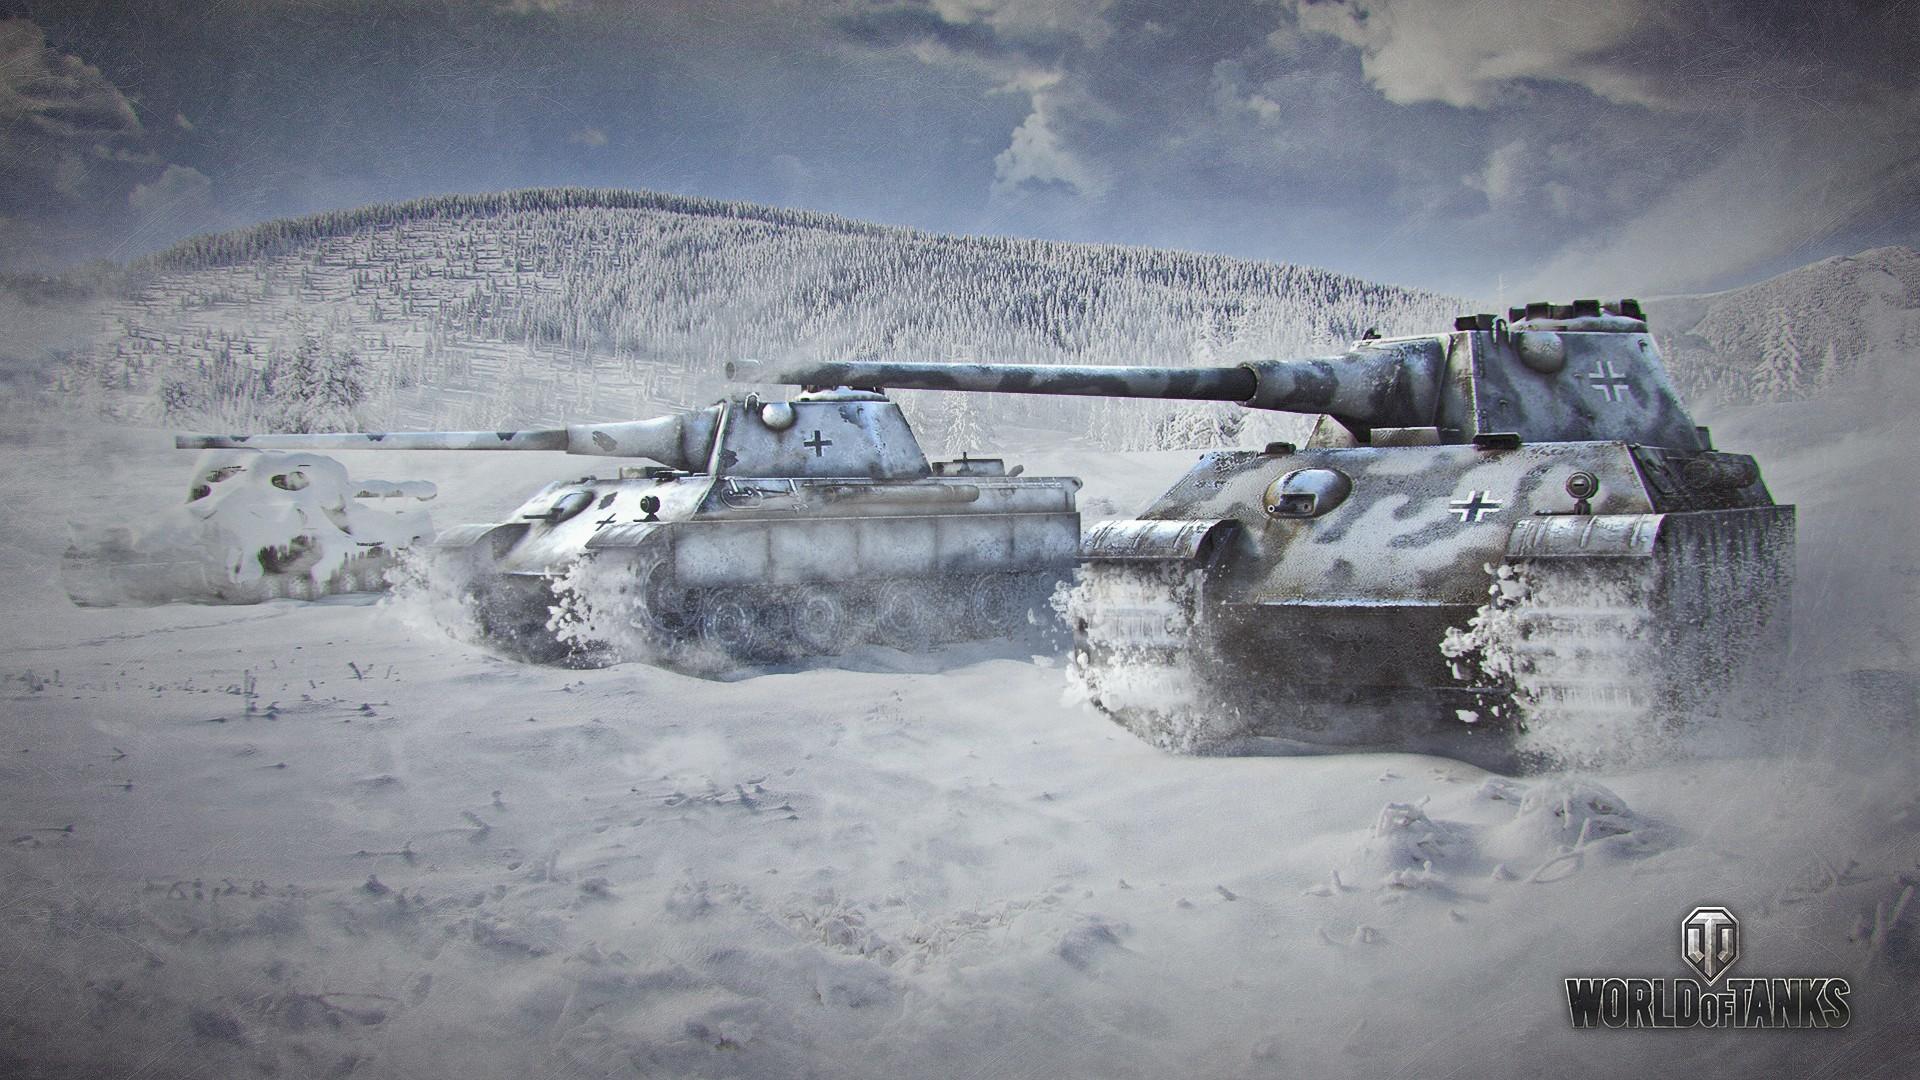 world of tanks wallpaper 1920x1080